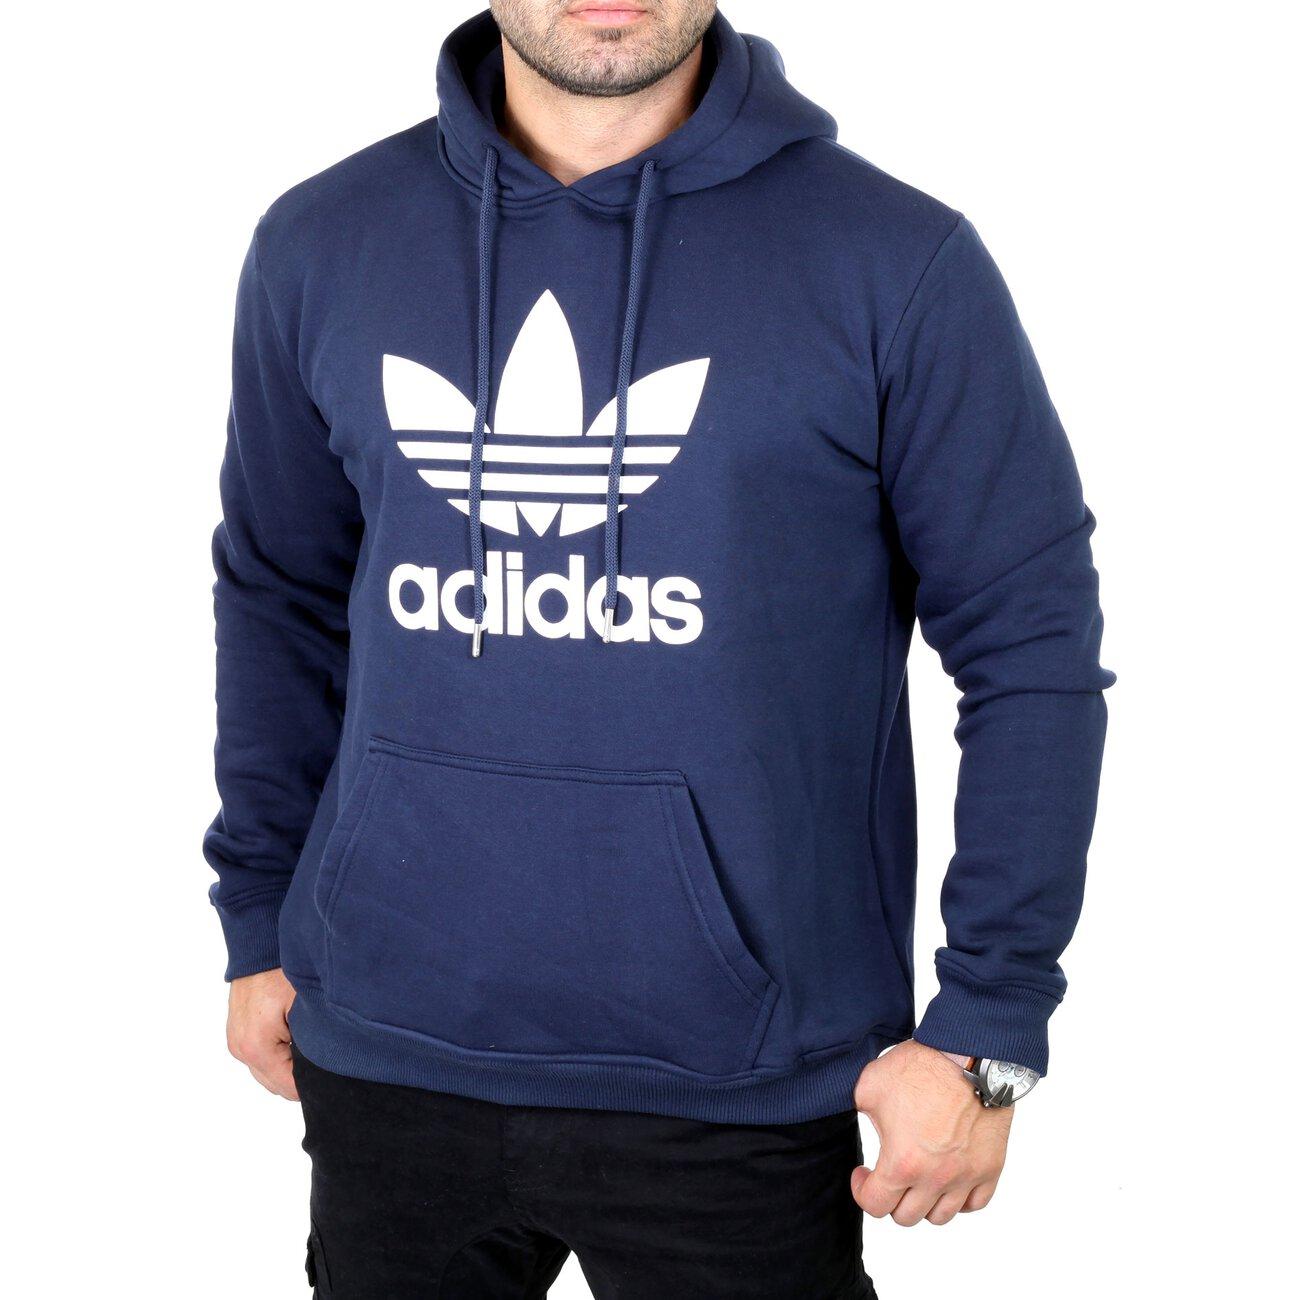 adidas sweatshirt herren pullover trefoil kapuzen hoodie. Black Bedroom Furniture Sets. Home Design Ideas